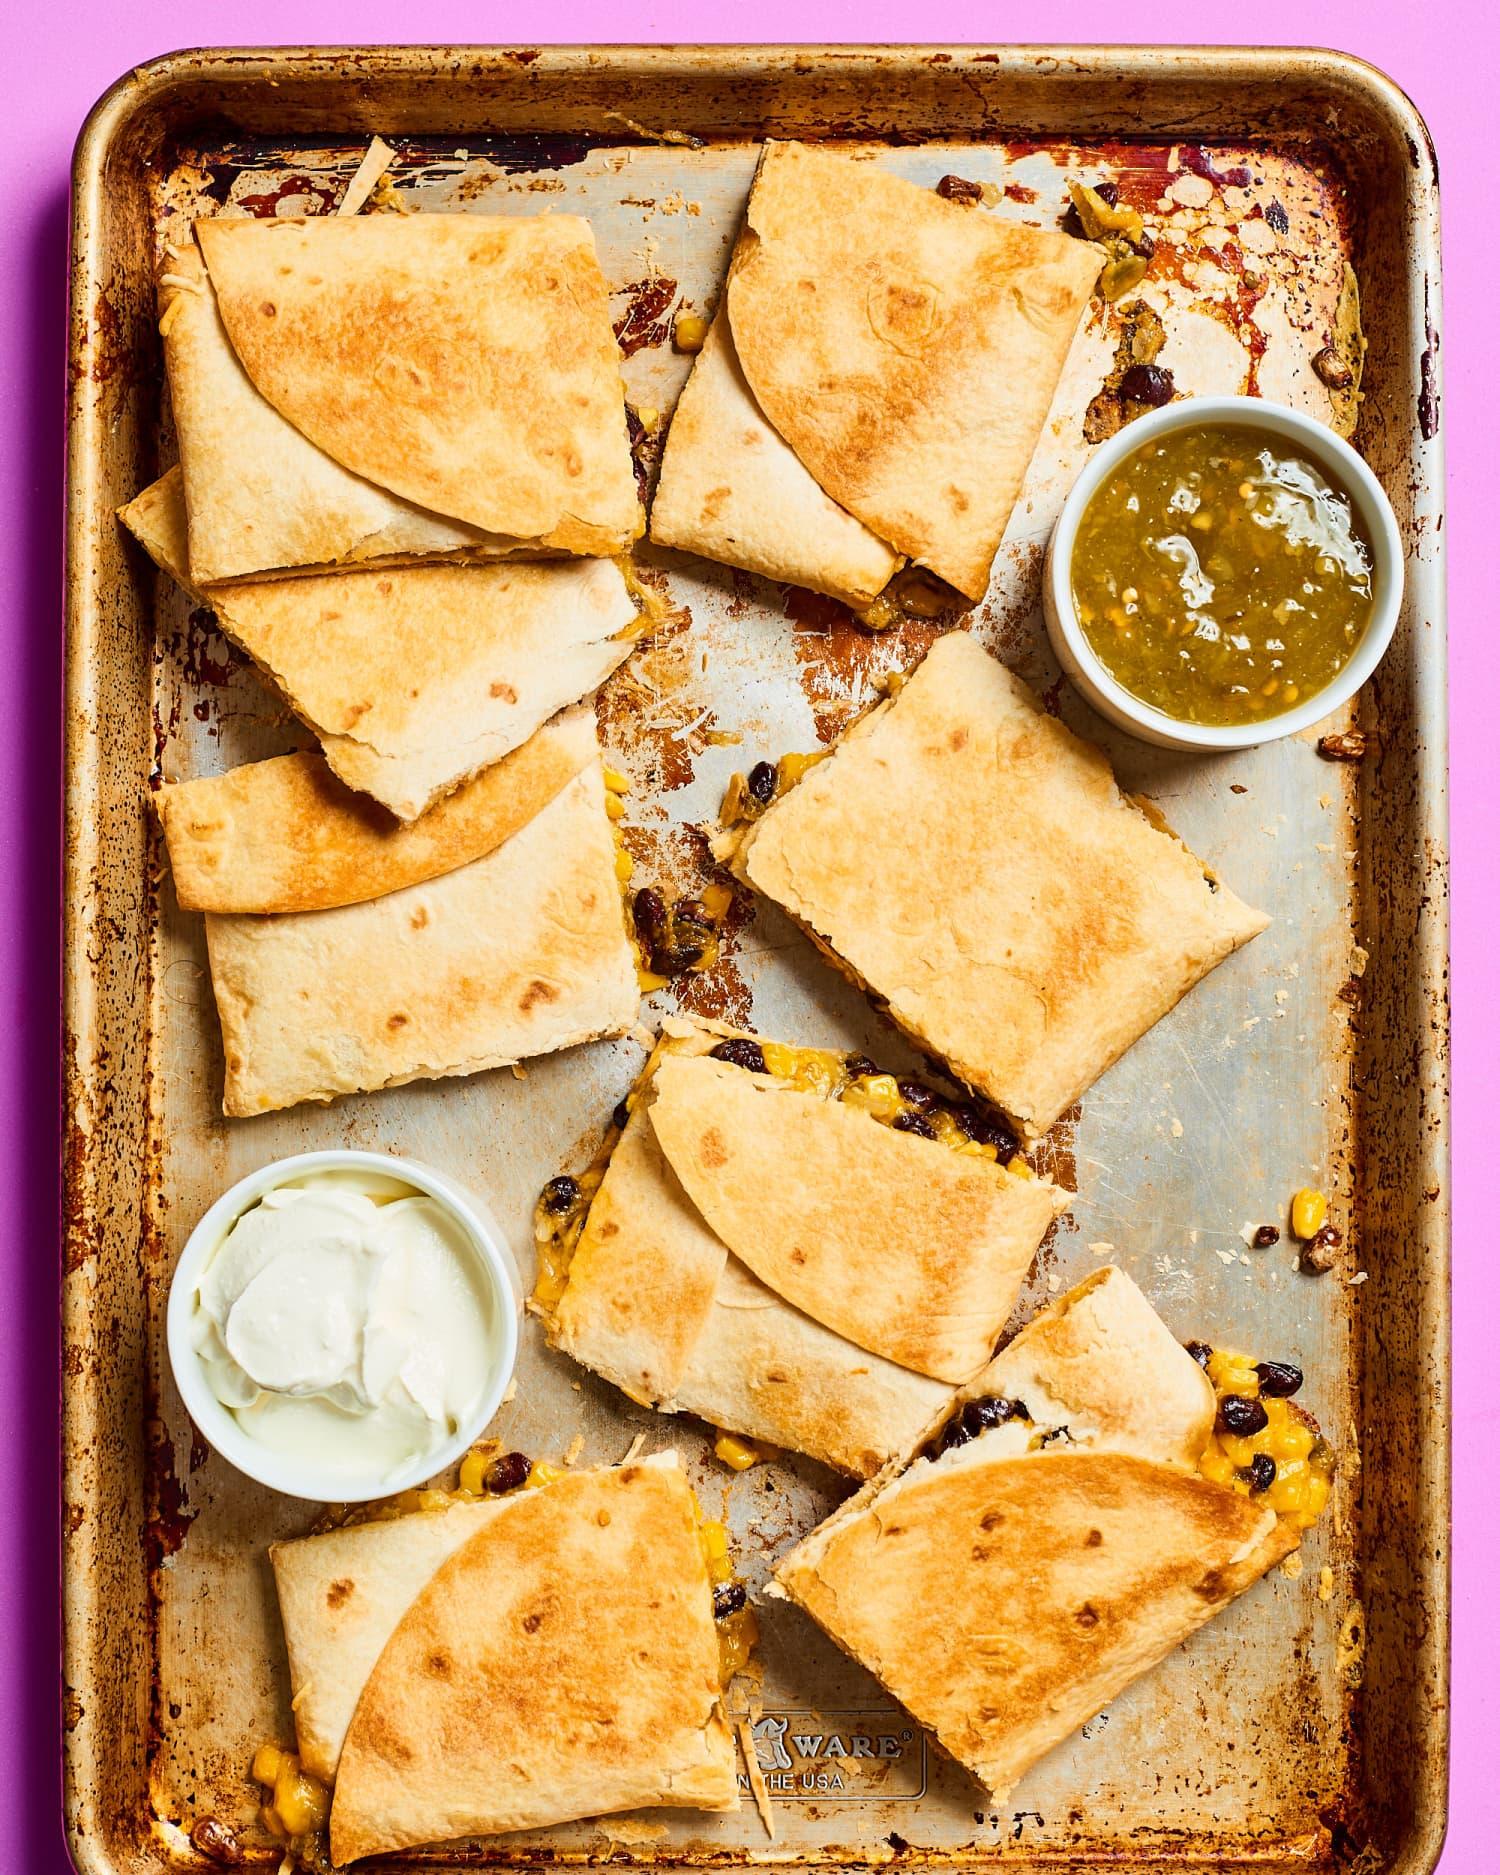 Sheet Pan Quesadillas Are a One-Pan Dream